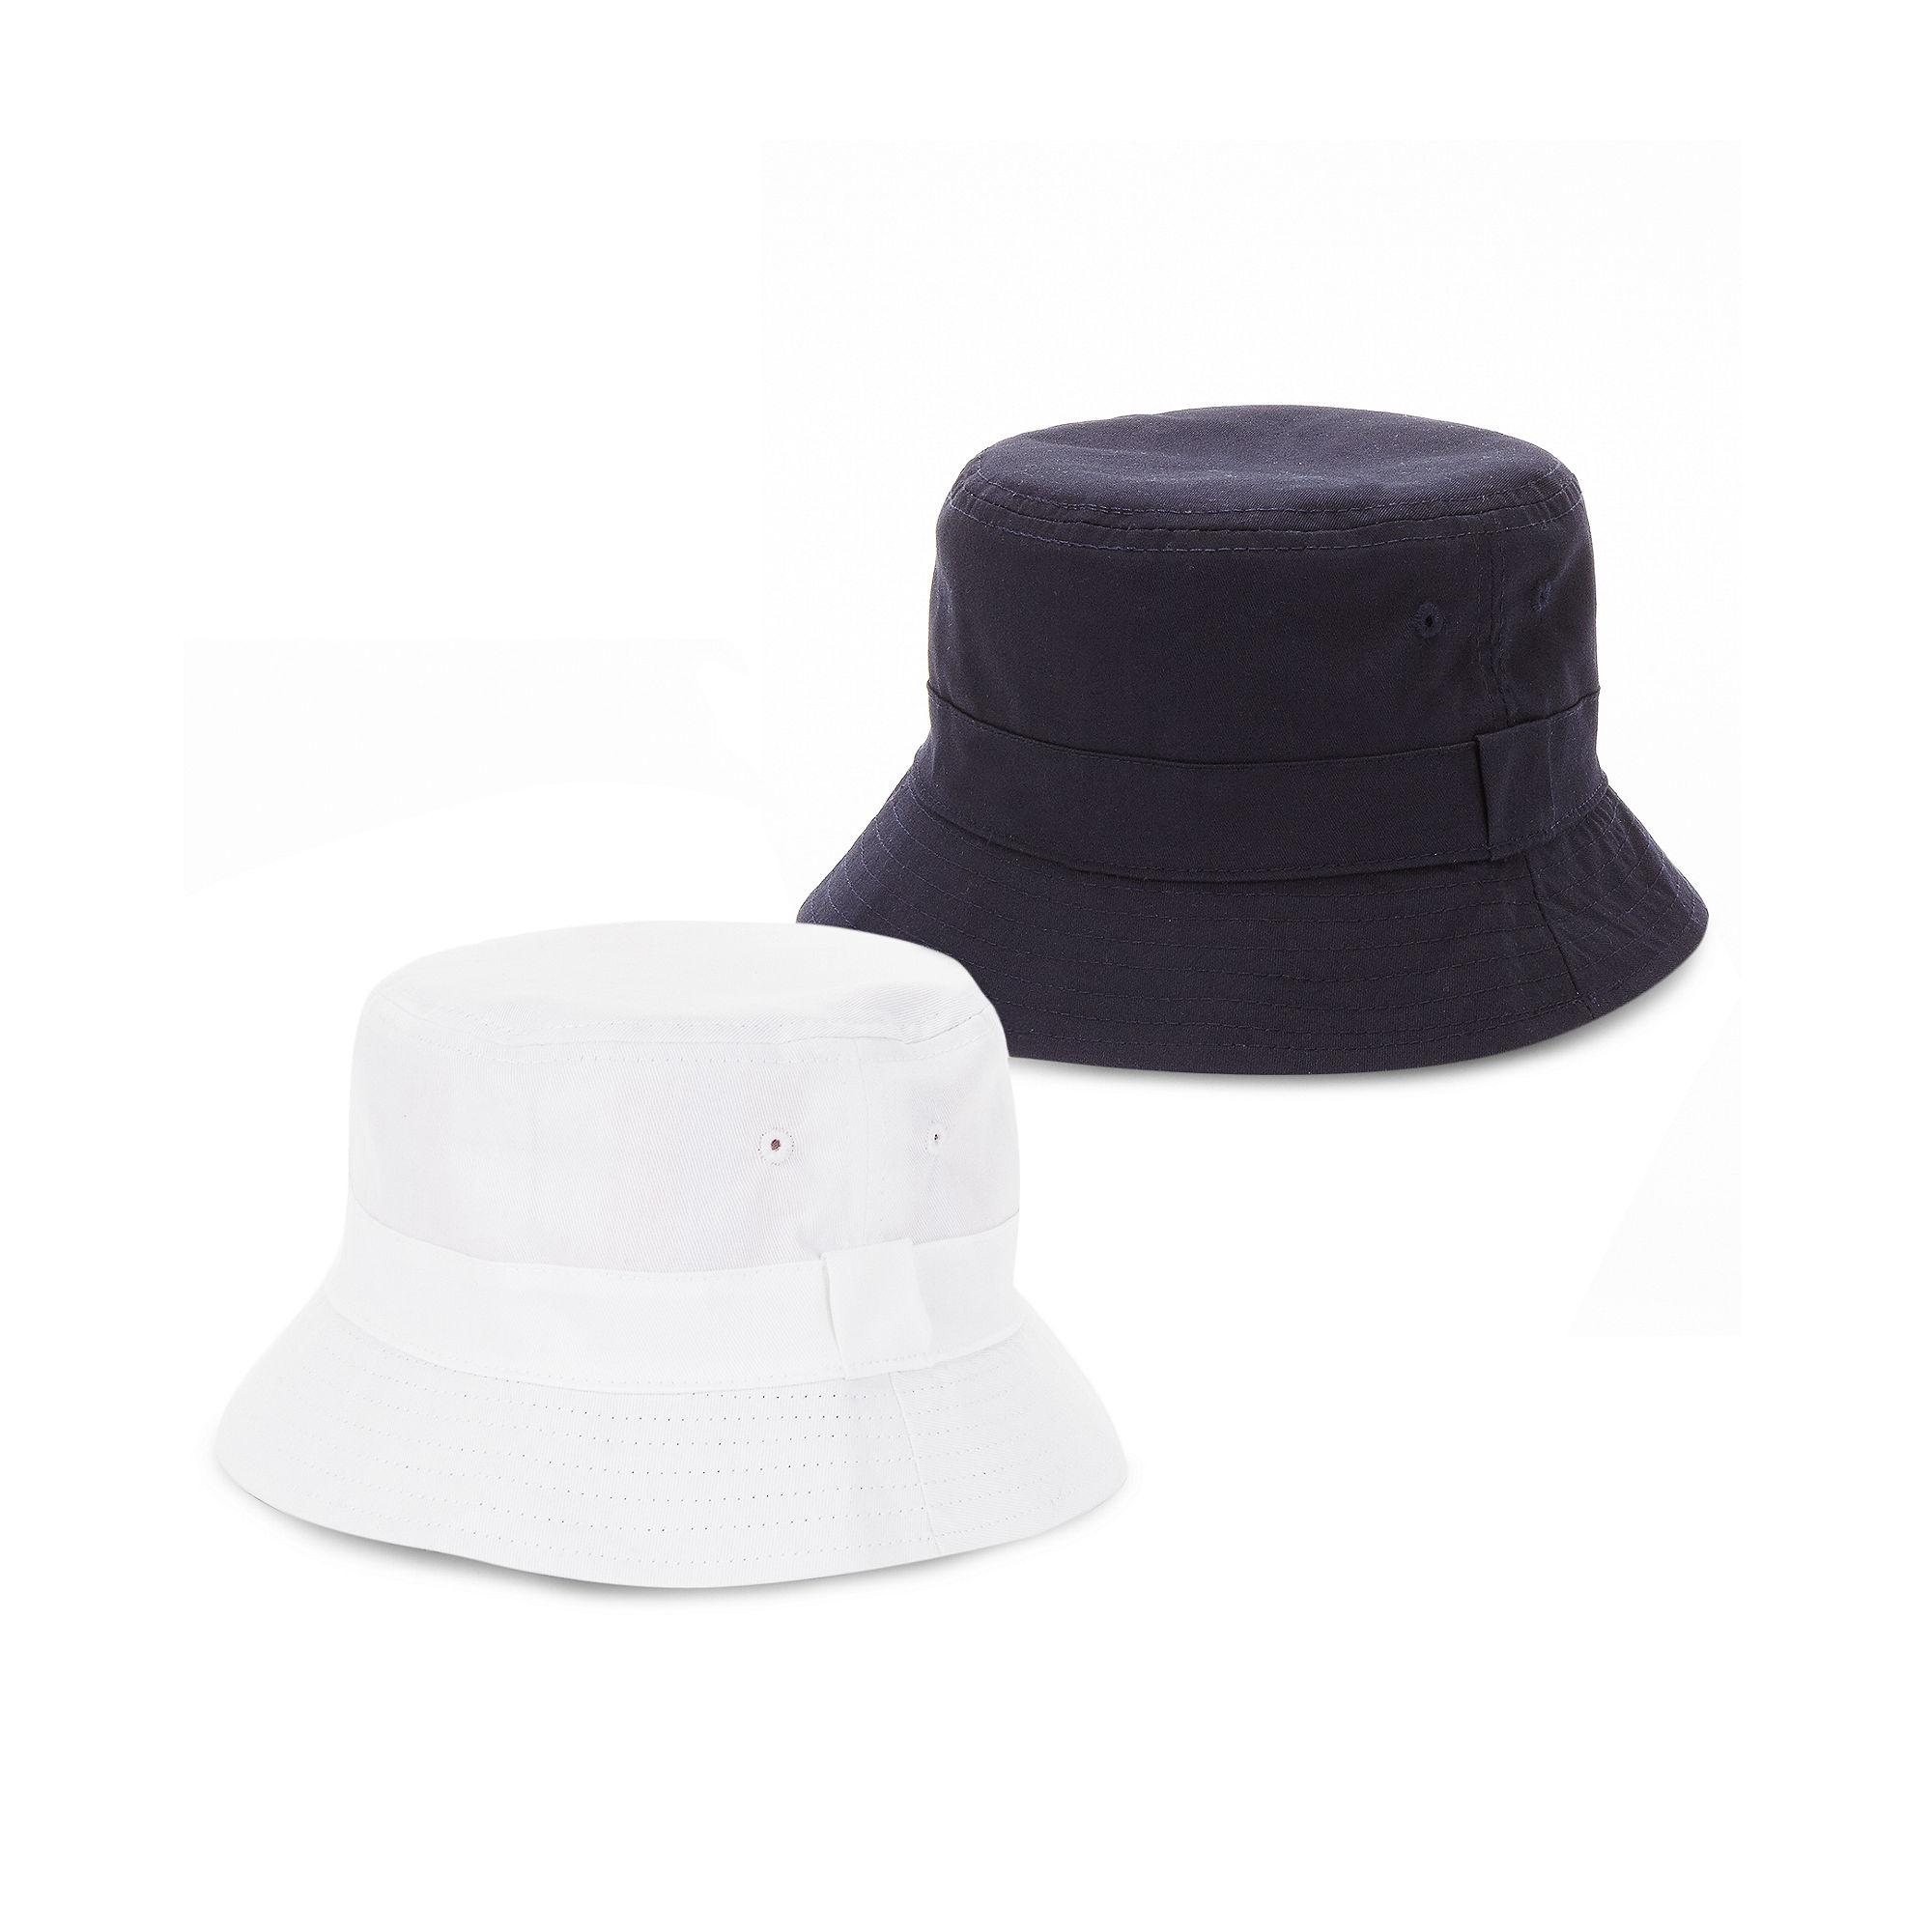 ca288770230 Lyst - Sean John Plaid Reversible Bucket Hat in White for Men